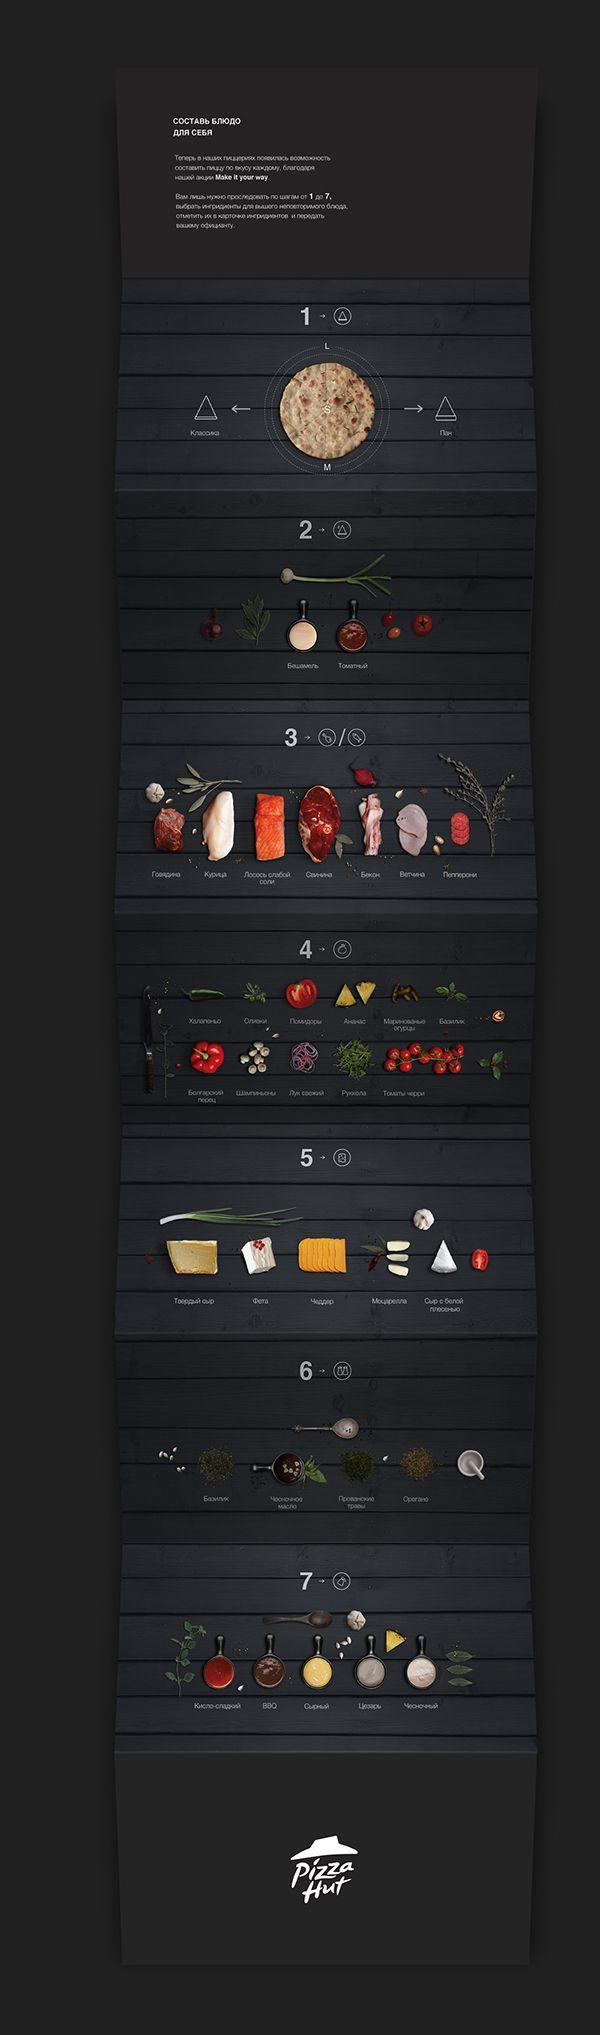 Food menu design on Behance                                                                                                                                                     More                                                                                                                                                                                 Plus